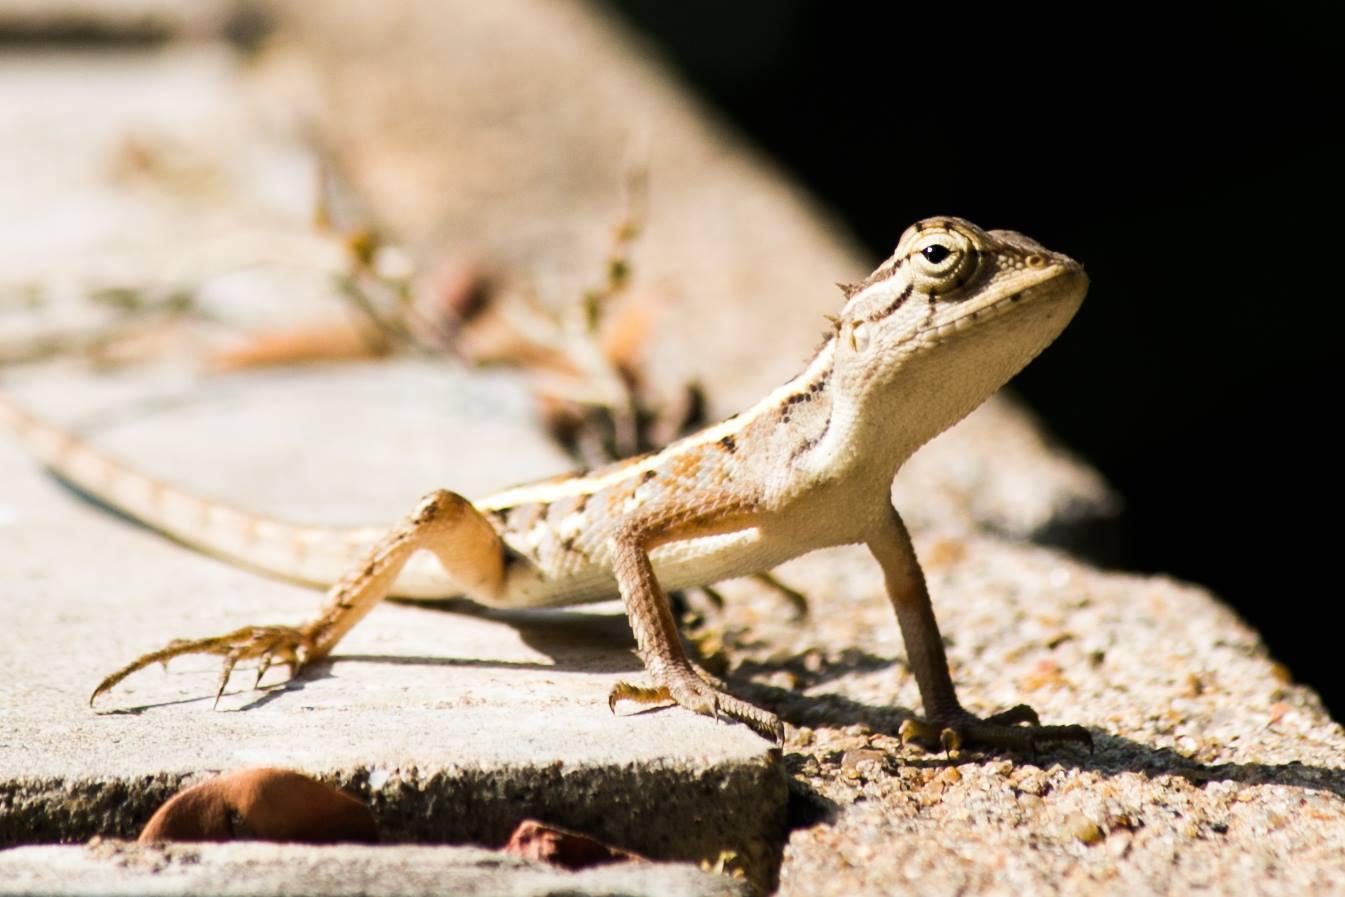 invite-to-paradise-sri-lanka-and-maldives-specialists-travel-agent-tour-operator-customer-review-feedback-joel-rhian-lizard.jpg